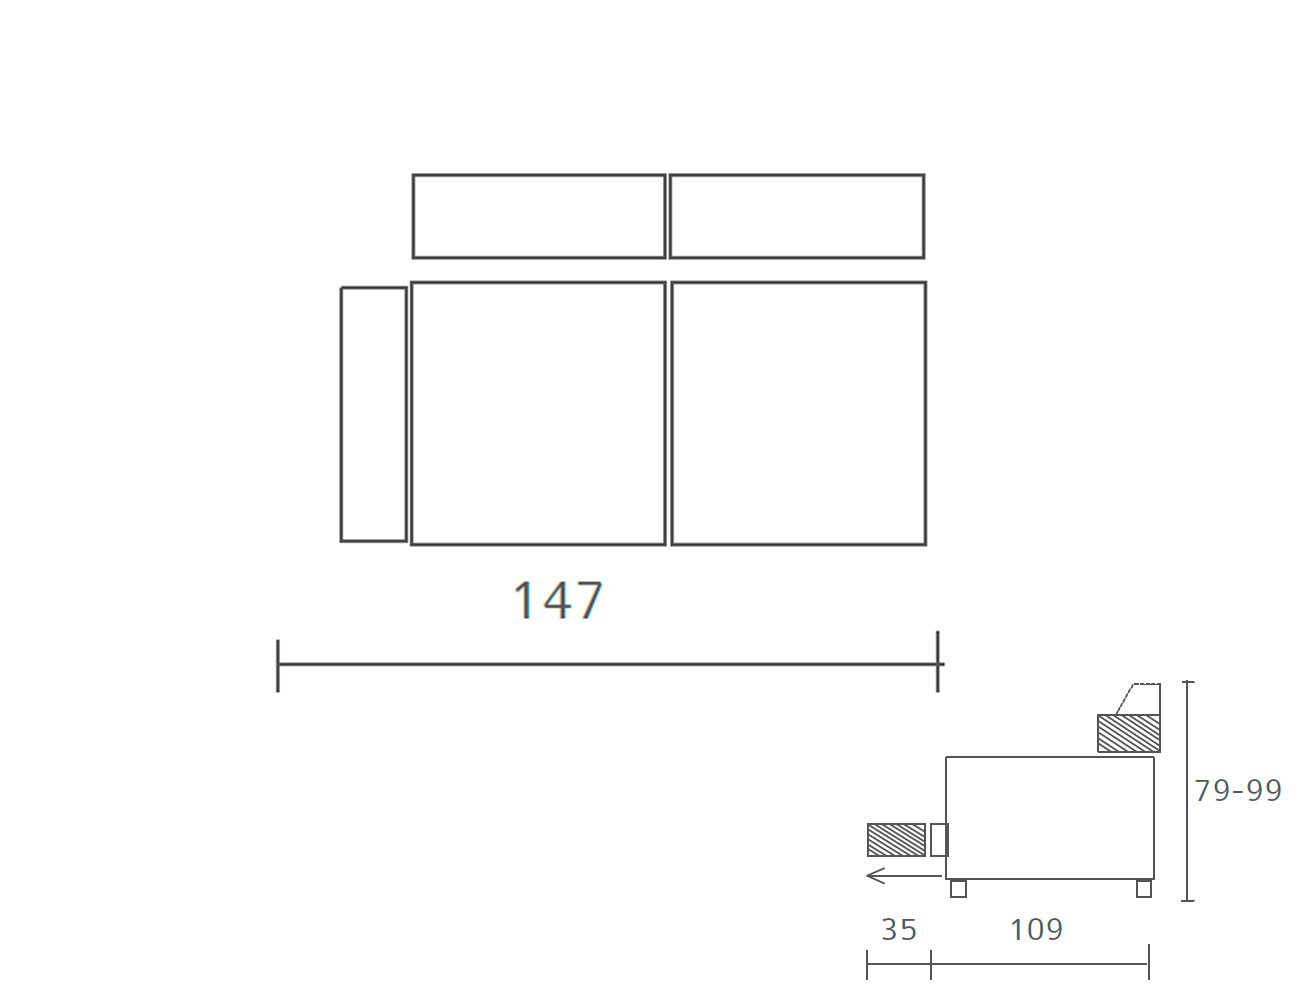 Sofa piel 2 plazas 1473